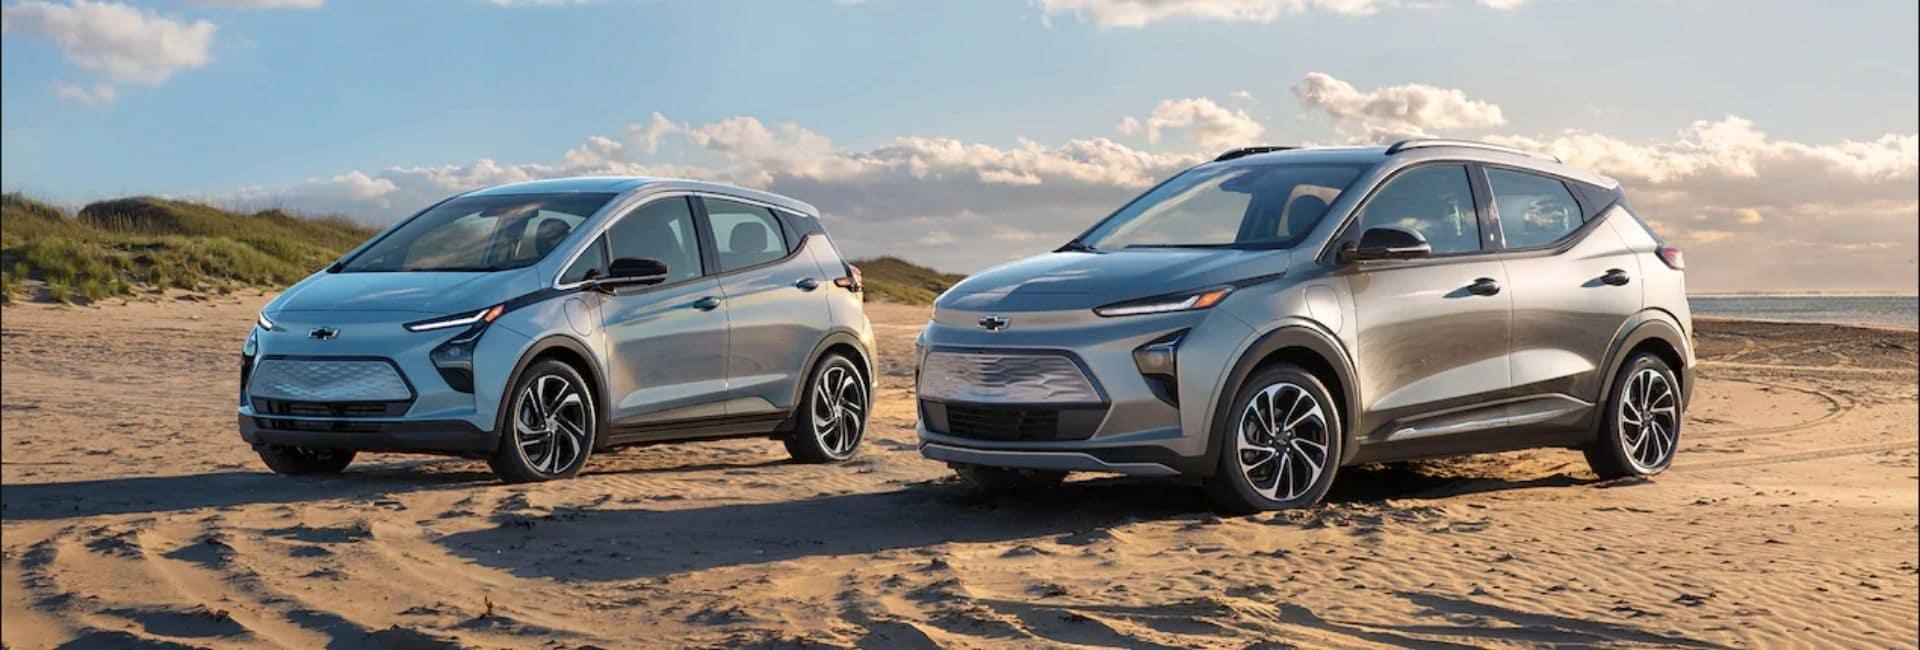 2022 Chevrolet Bolt On The Beach With Sand